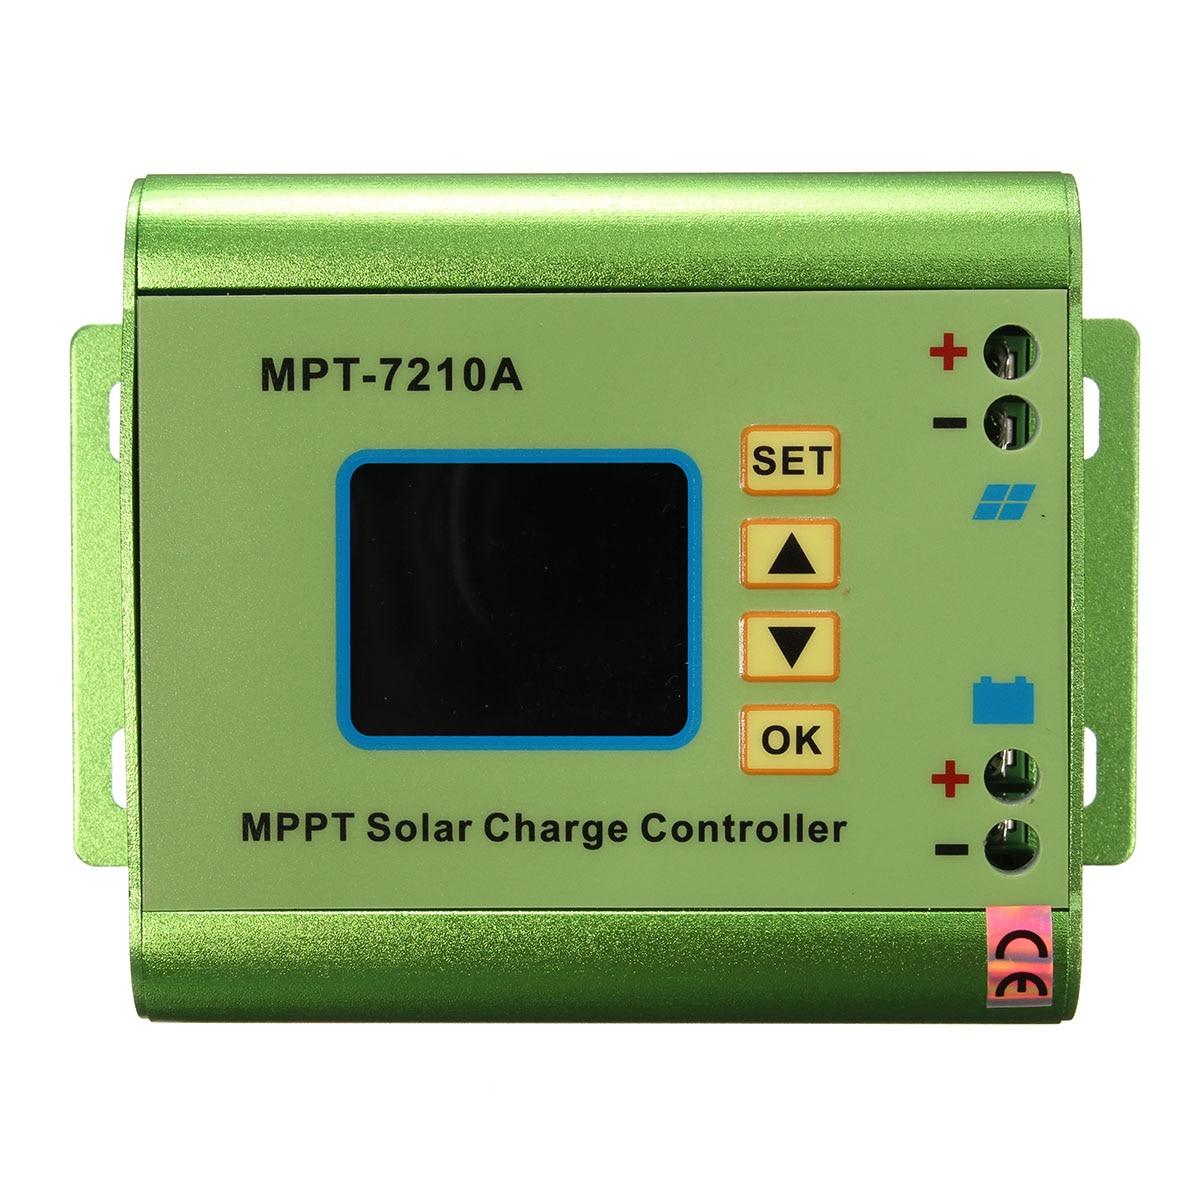 1Pcs LCD Display MPPT Solar Panel Charge Controller 24/36/48/60/72V Aluminum Alloy Solar Battery Regulatir Controller 24 36 48 60 72v lcd display mpt 7210a mppt solar panel charge controller boost solar battery regulatir controller